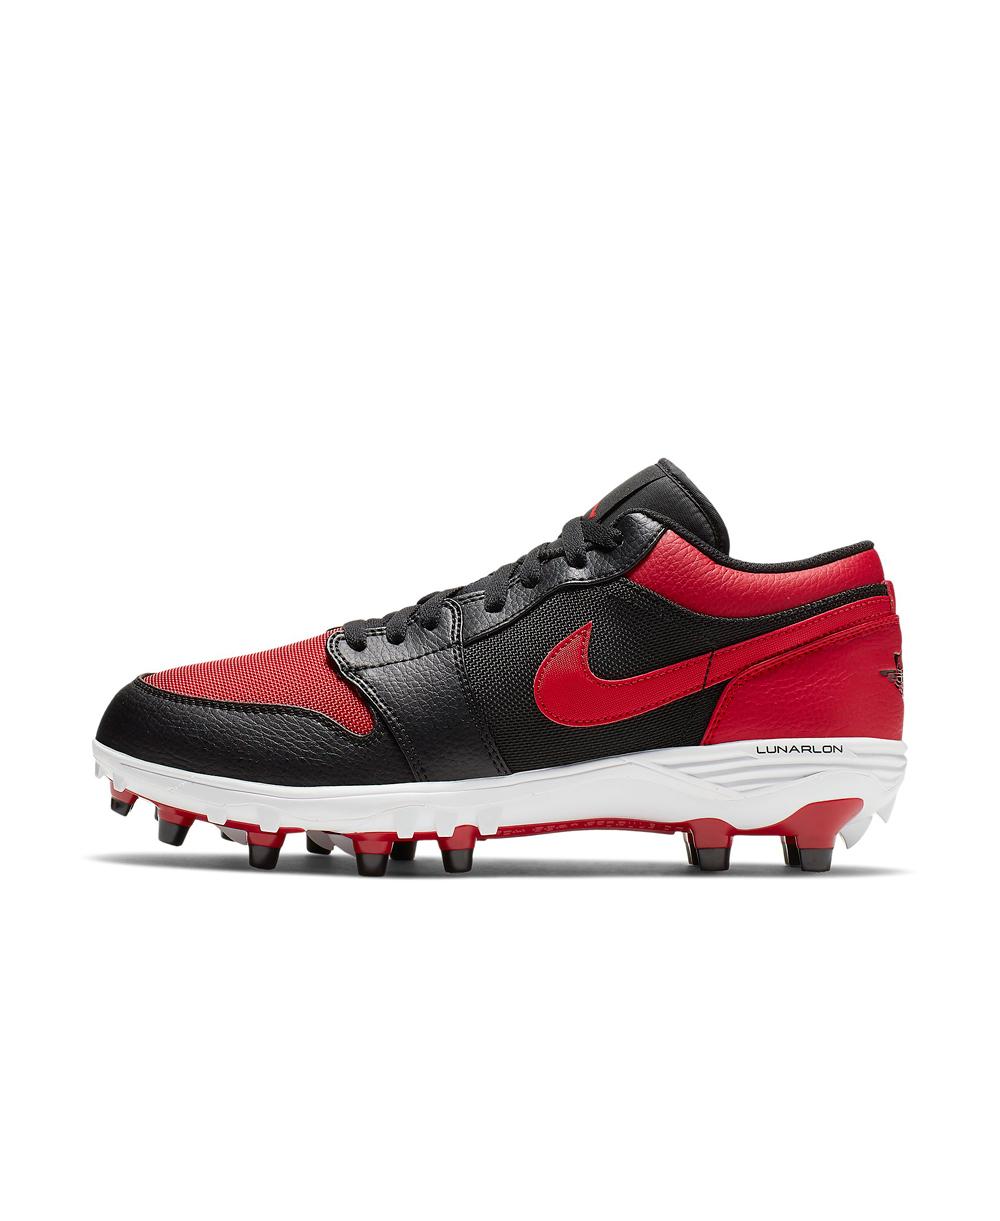 tachones nike futbol americano, Air Jordan 3 Iii Retro